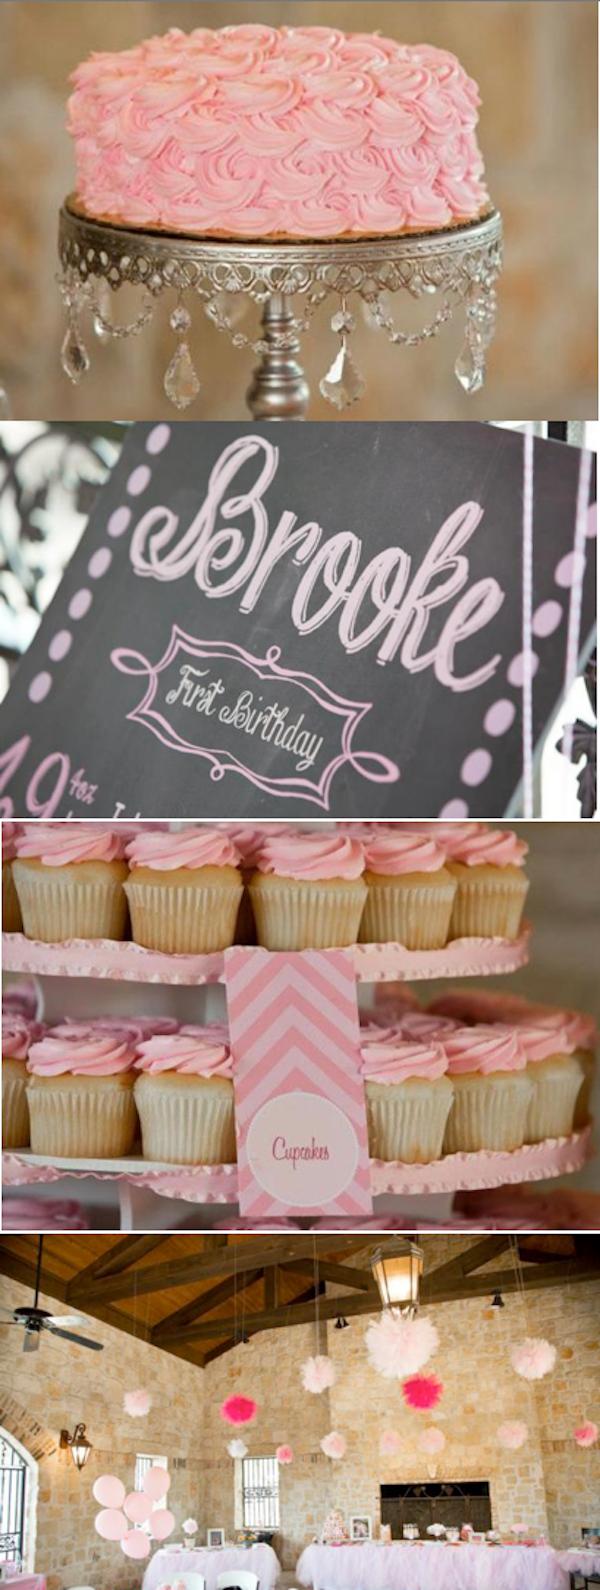 Sweet Vintage Pink Chevron 1st Birthday Party via Kara's Party Ideas KarasPartyIdeas.com #sweet #vintage #pink #chevron #1st #birthday #party #ideas